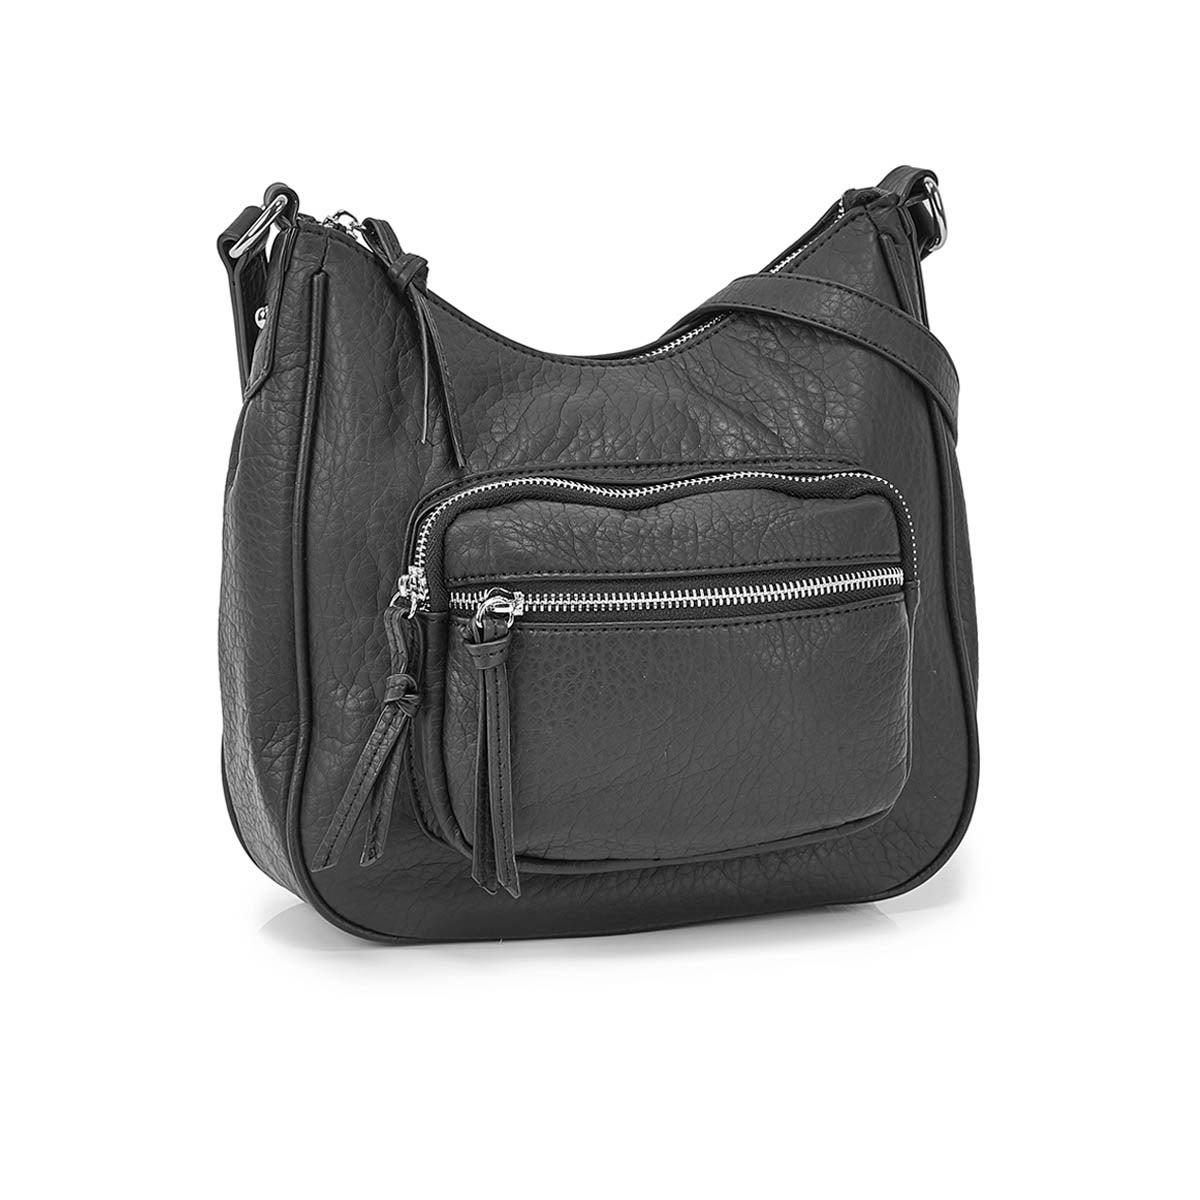 Women's 6402 black hobo crossbody bags